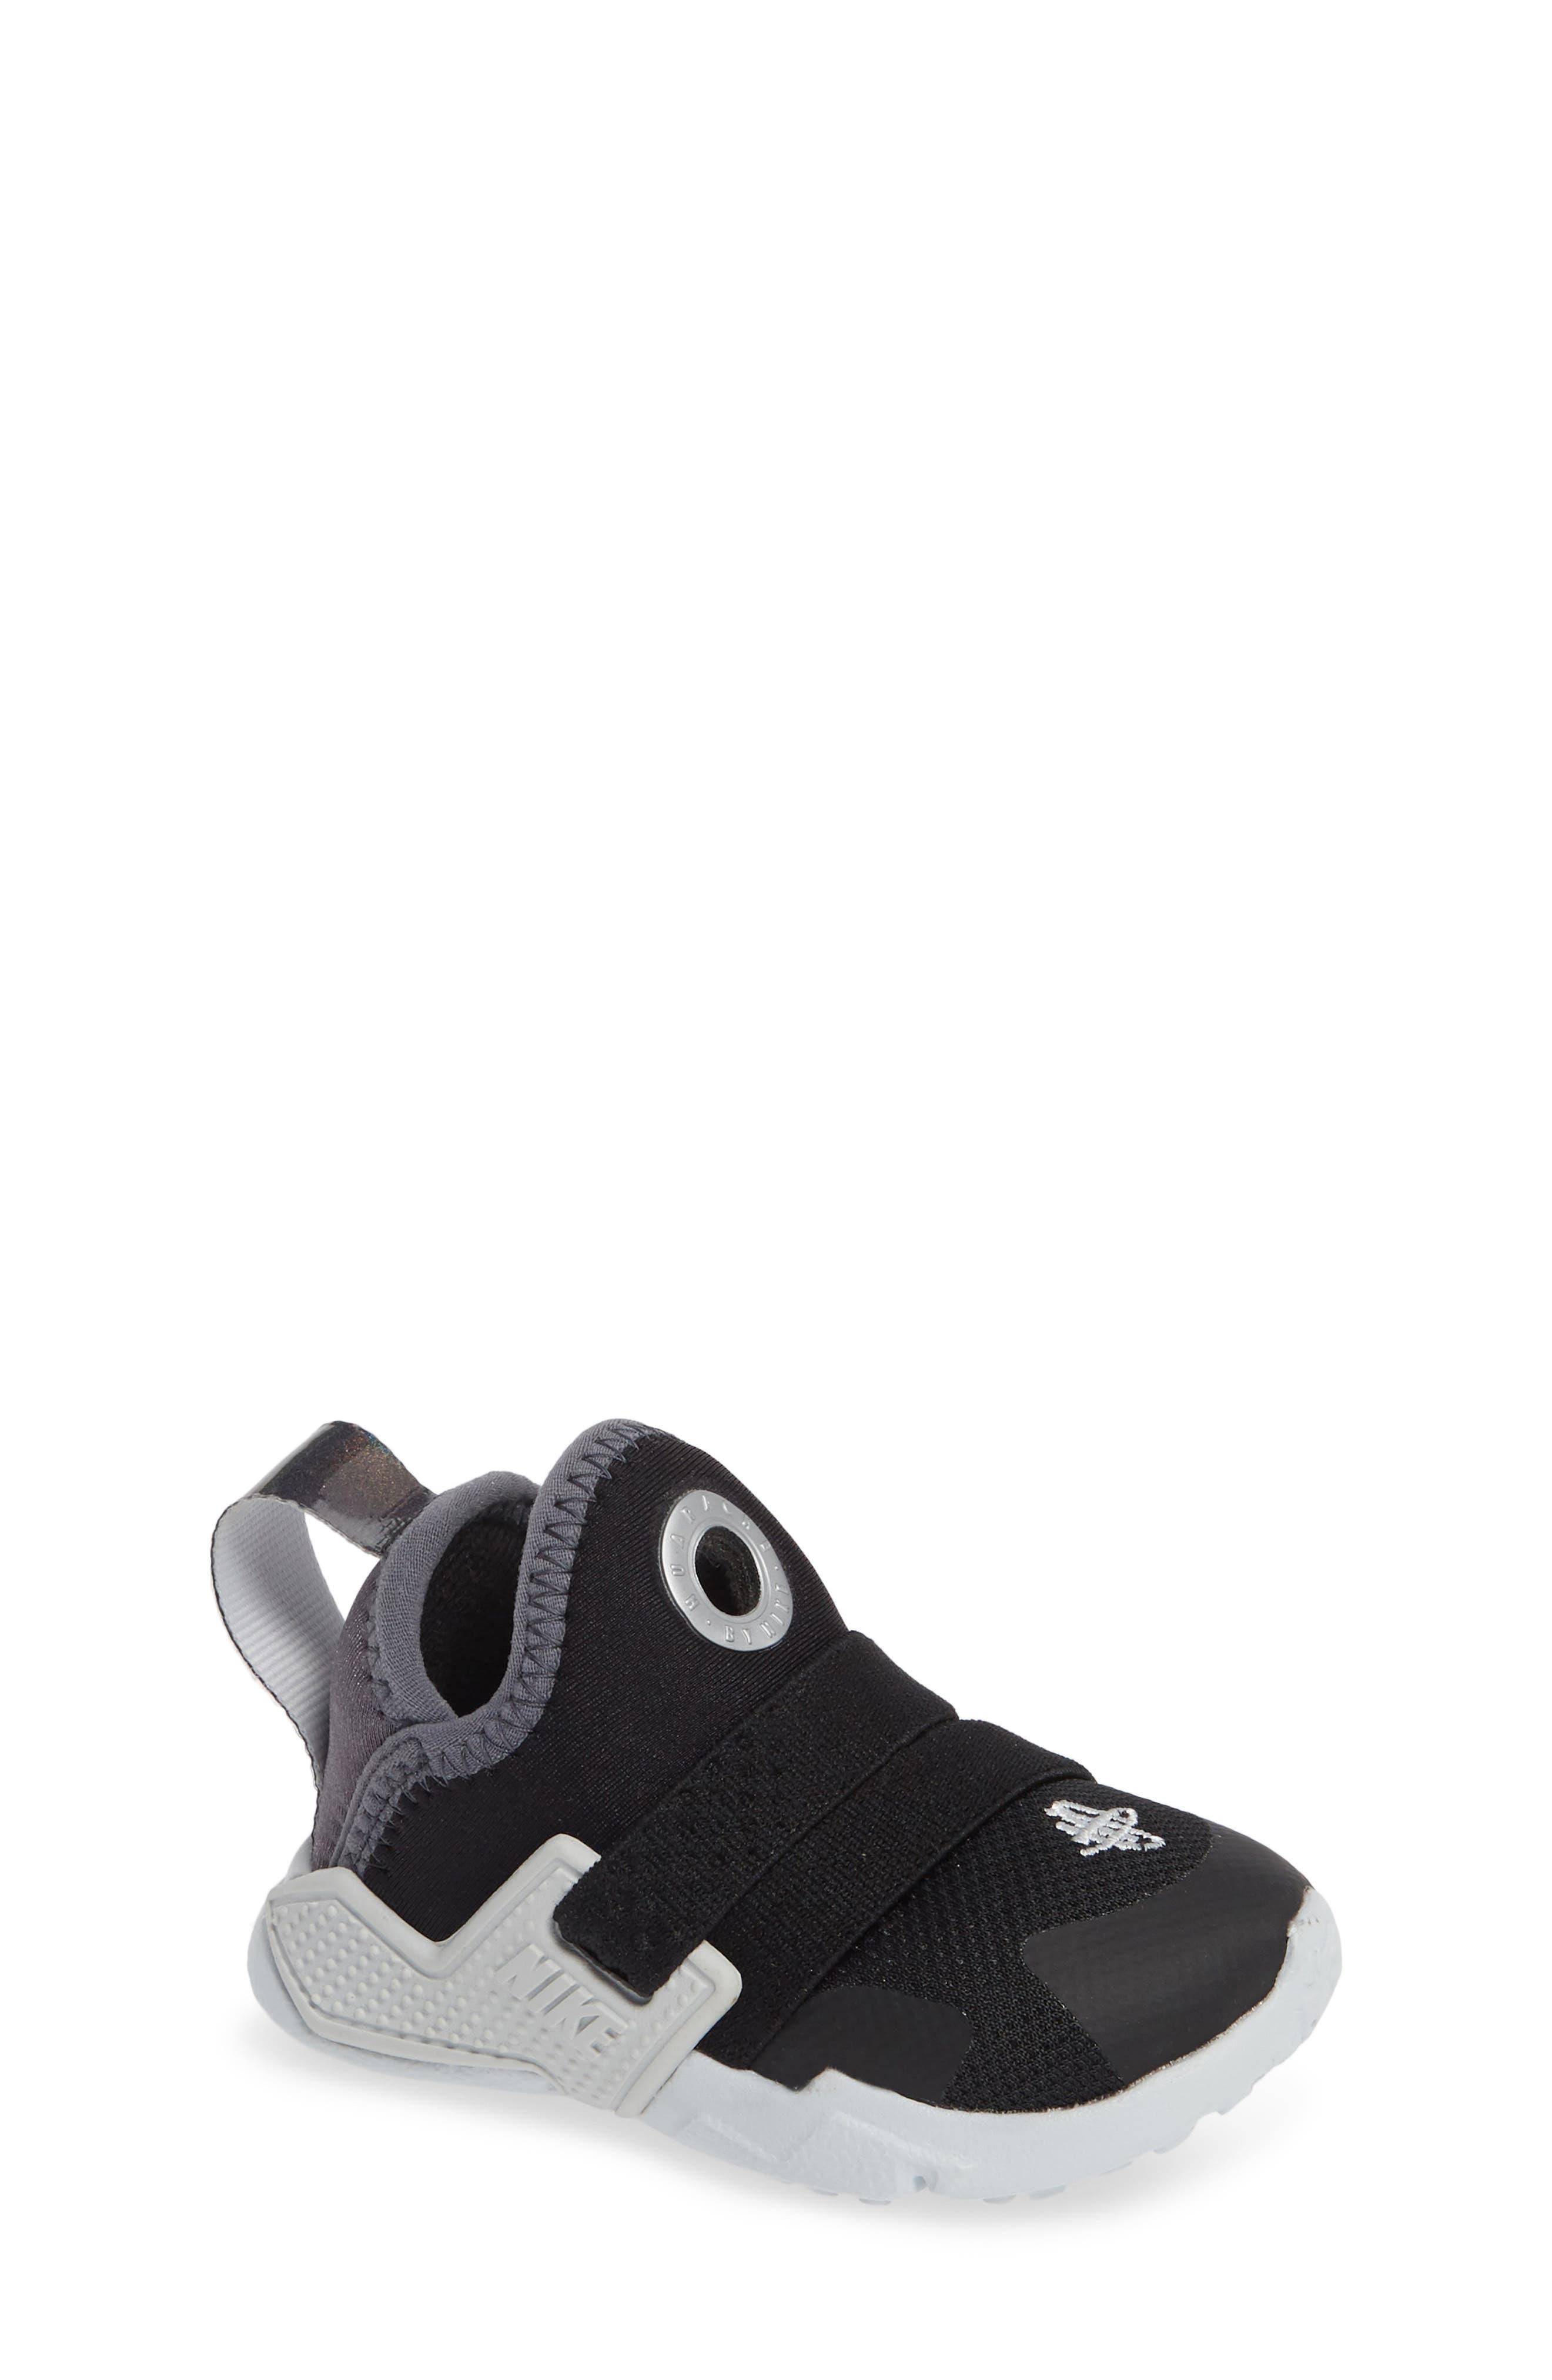 NIKE, Huarache Extreme Sneaker, Main thumbnail 1, color, BLACK/ METALLIC SILVER-GREY